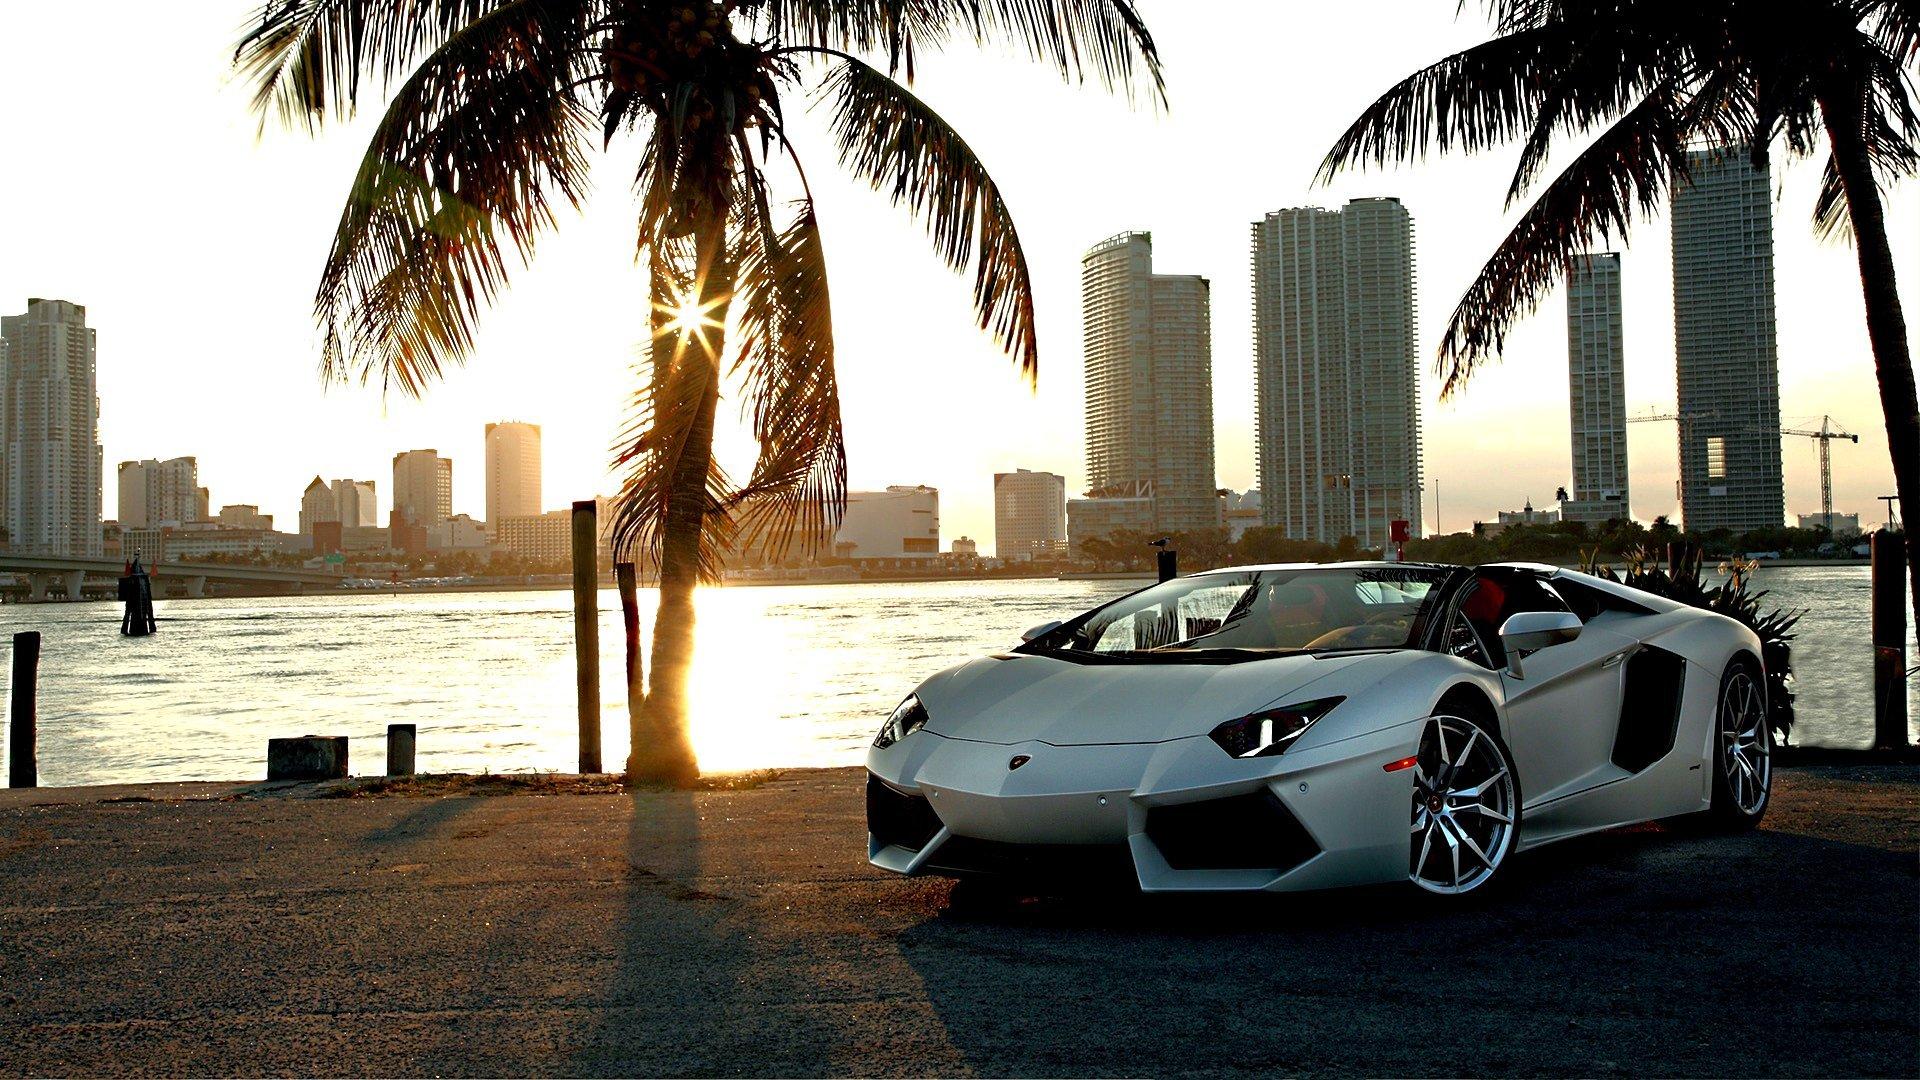 Lamborghini Aventador Wallpapers 1920x1080 Full Hd 1080p Desktop Backgrounds